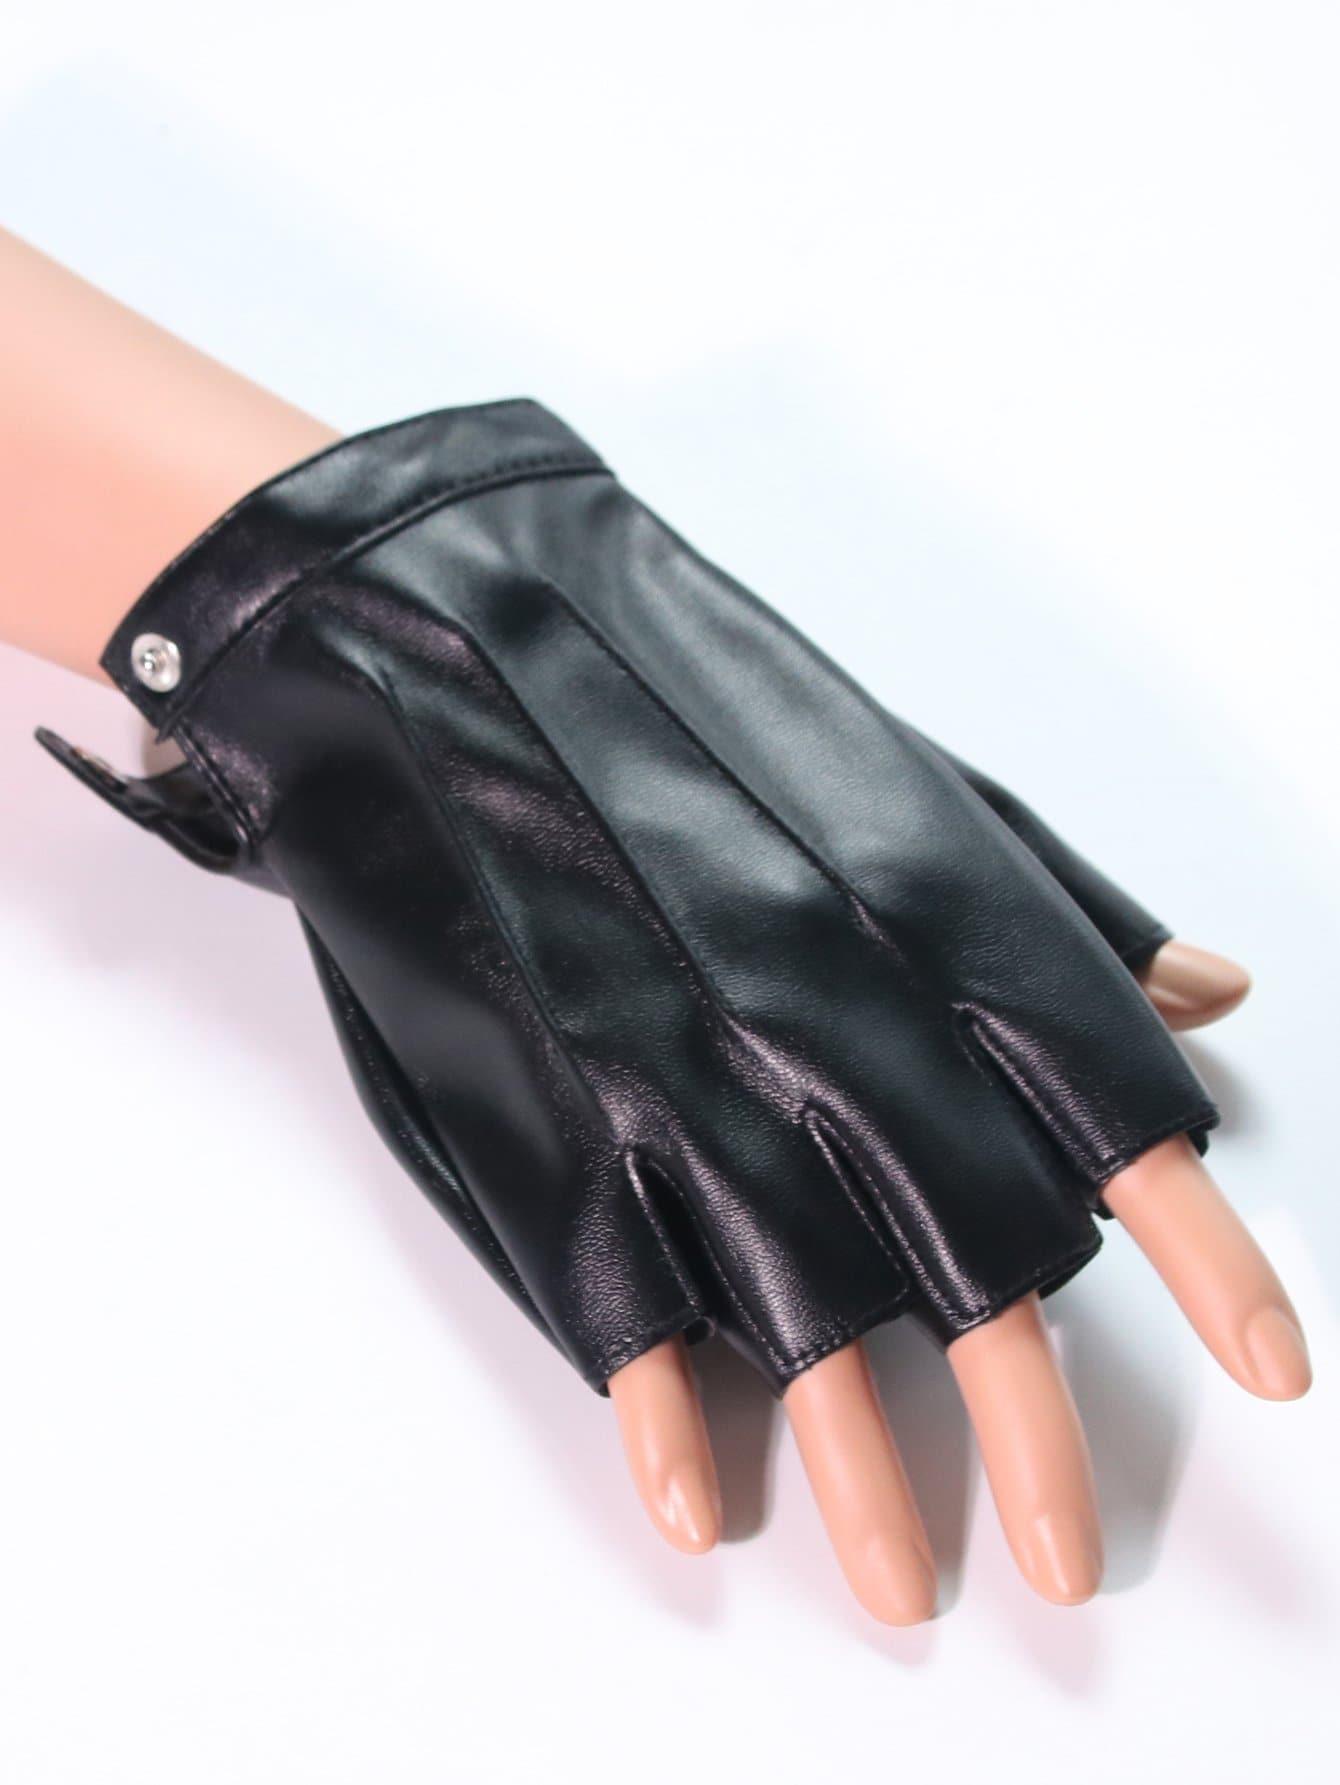 Мужчины Половины Пальцев Перчатки